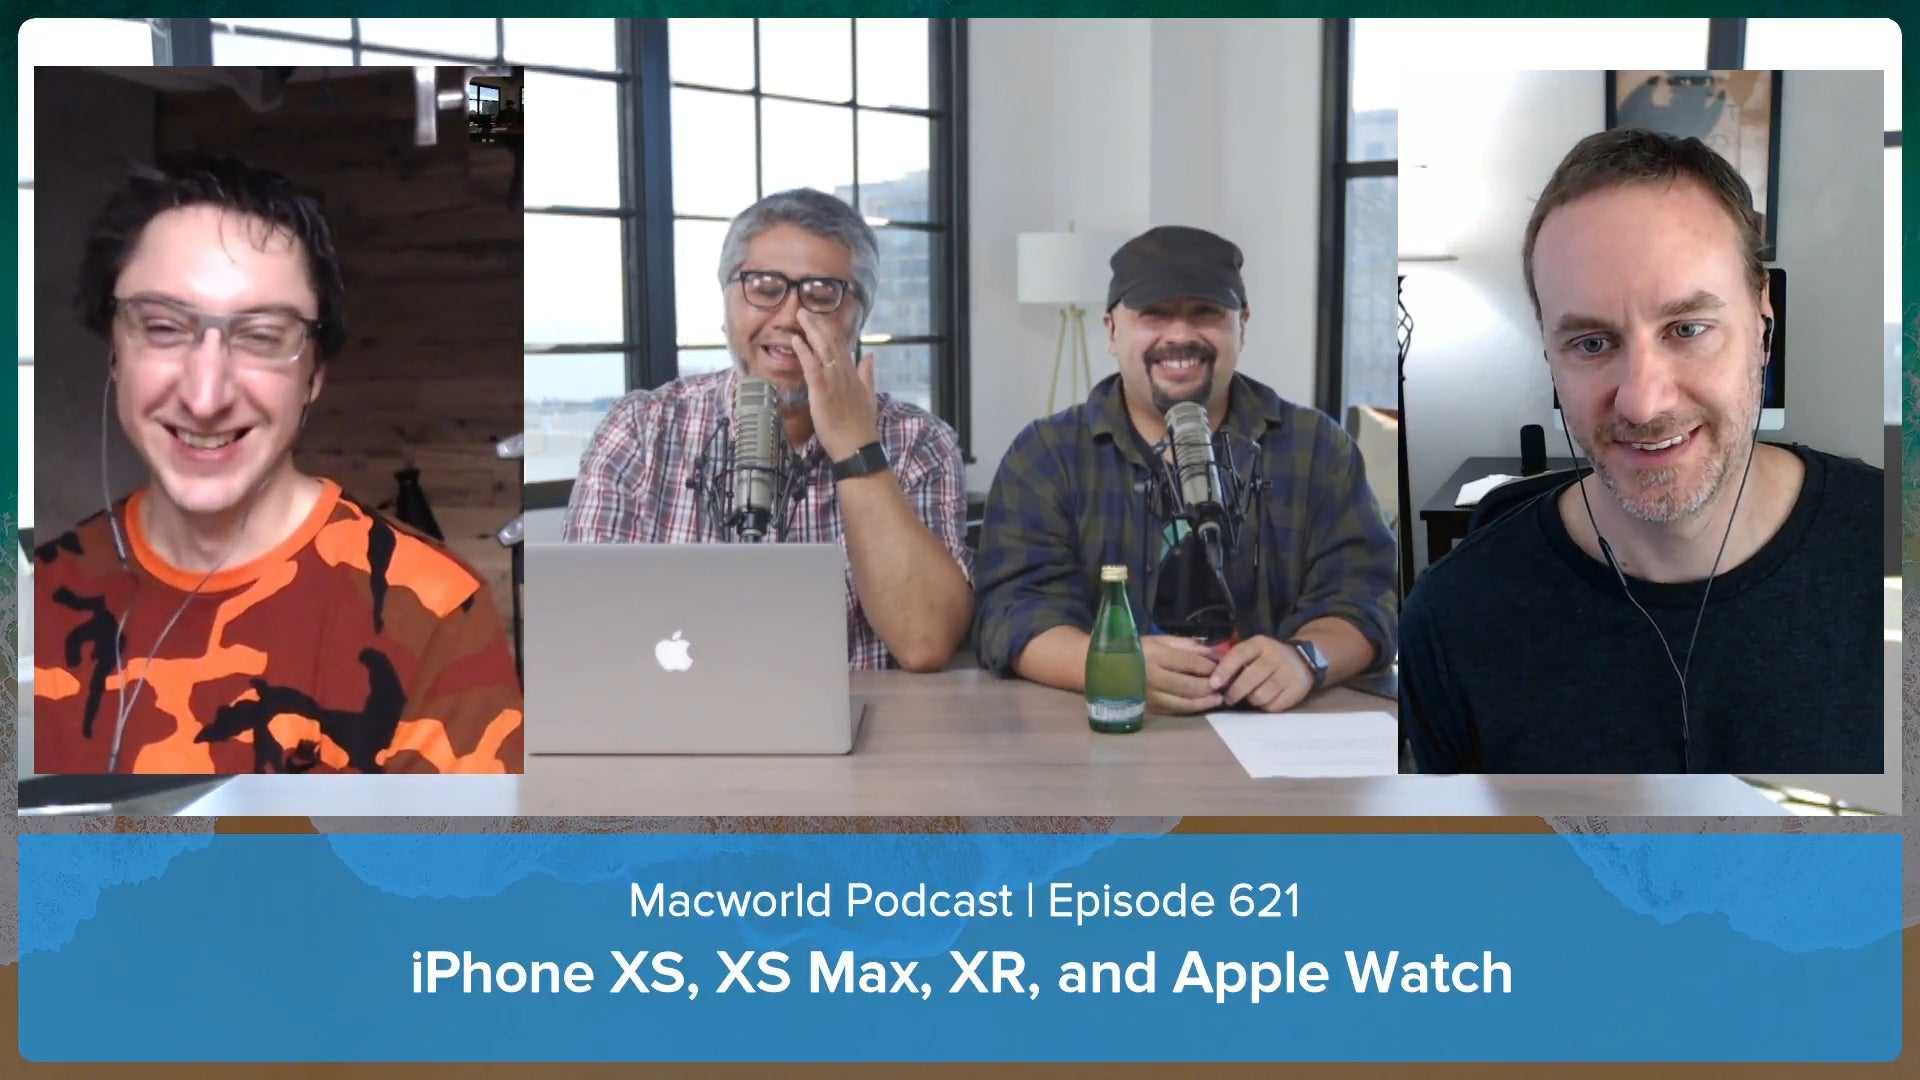 Macworld Podcast 621